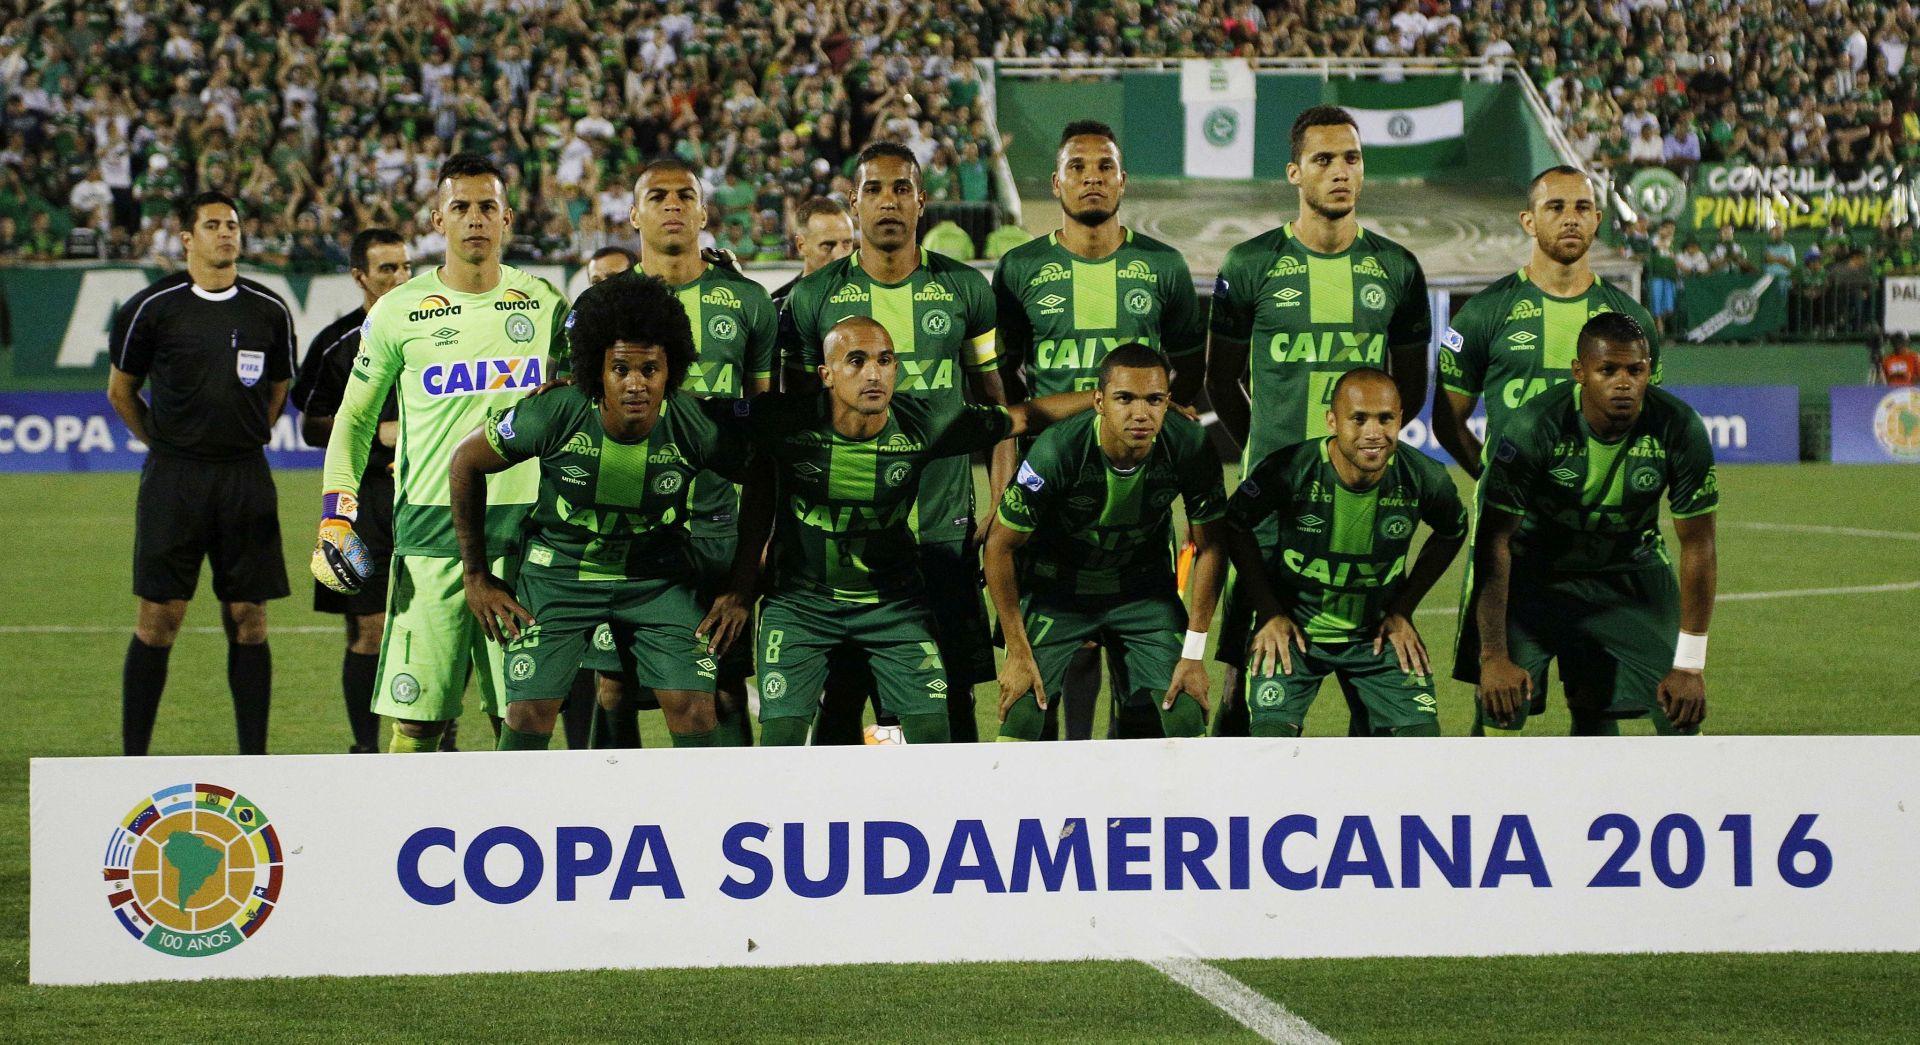 Brazilian Chapecoense